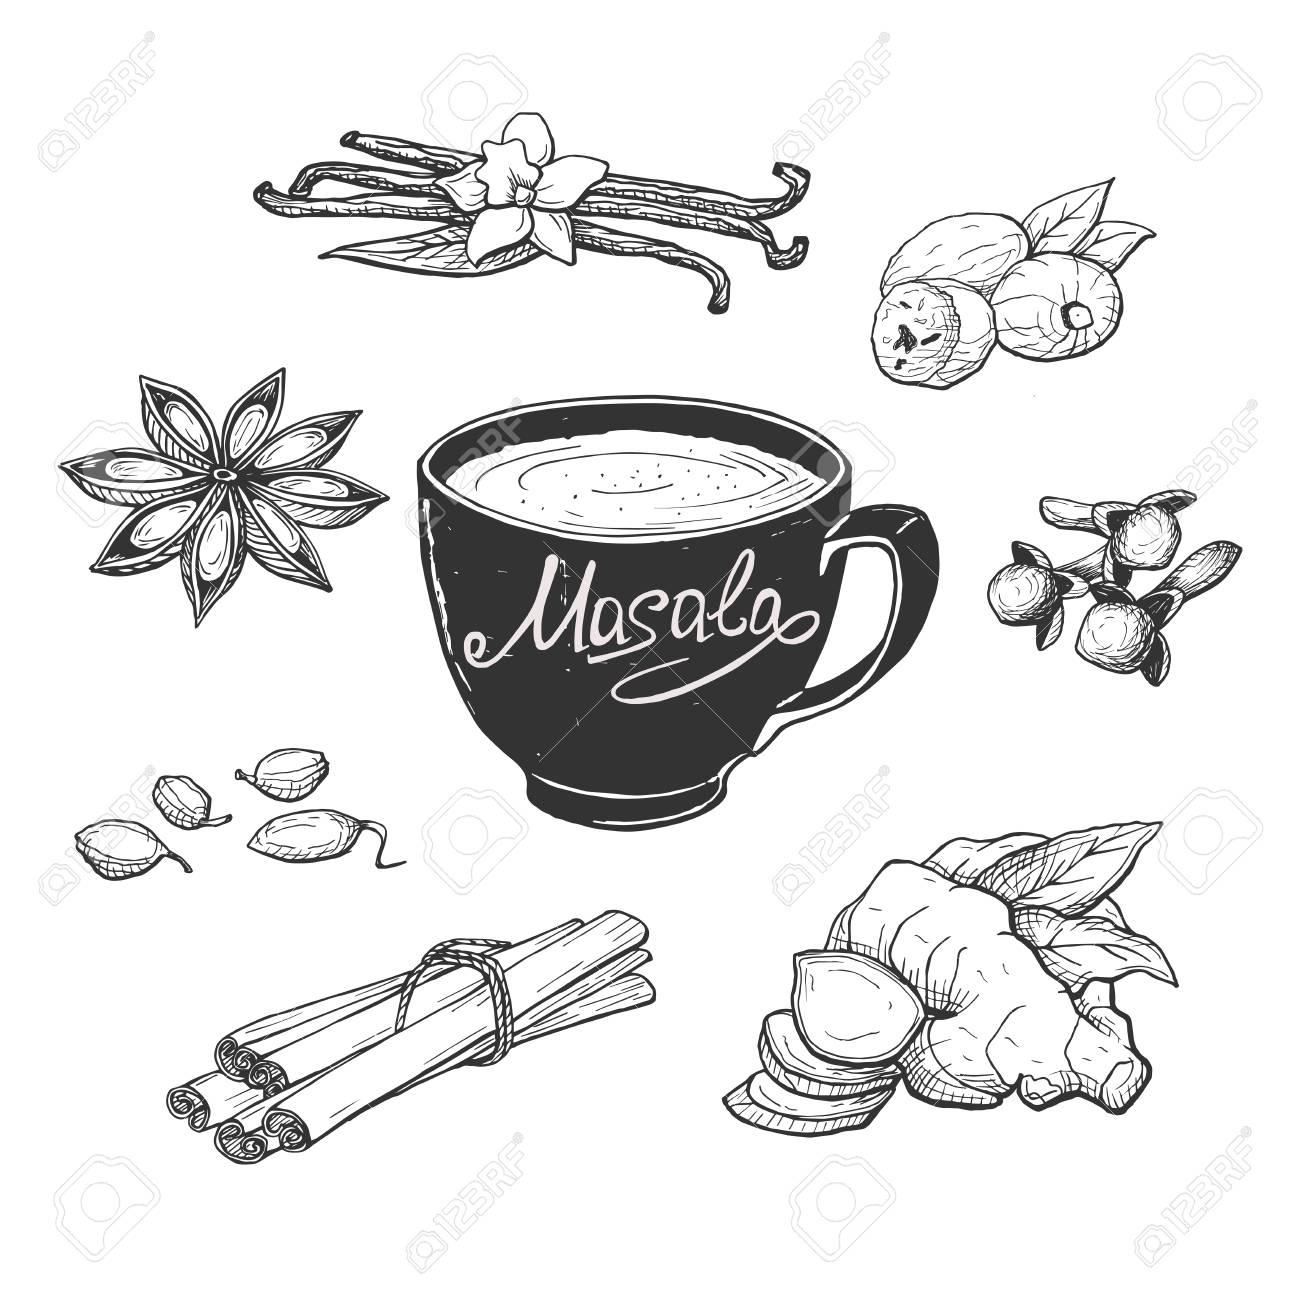 Vector illustration of masala milk tea cup and spices. Anise, clove, vanilla, cardamom, cinnamon sticks, ginger, nutmeg. Hand drawn engraving style. - 126336481